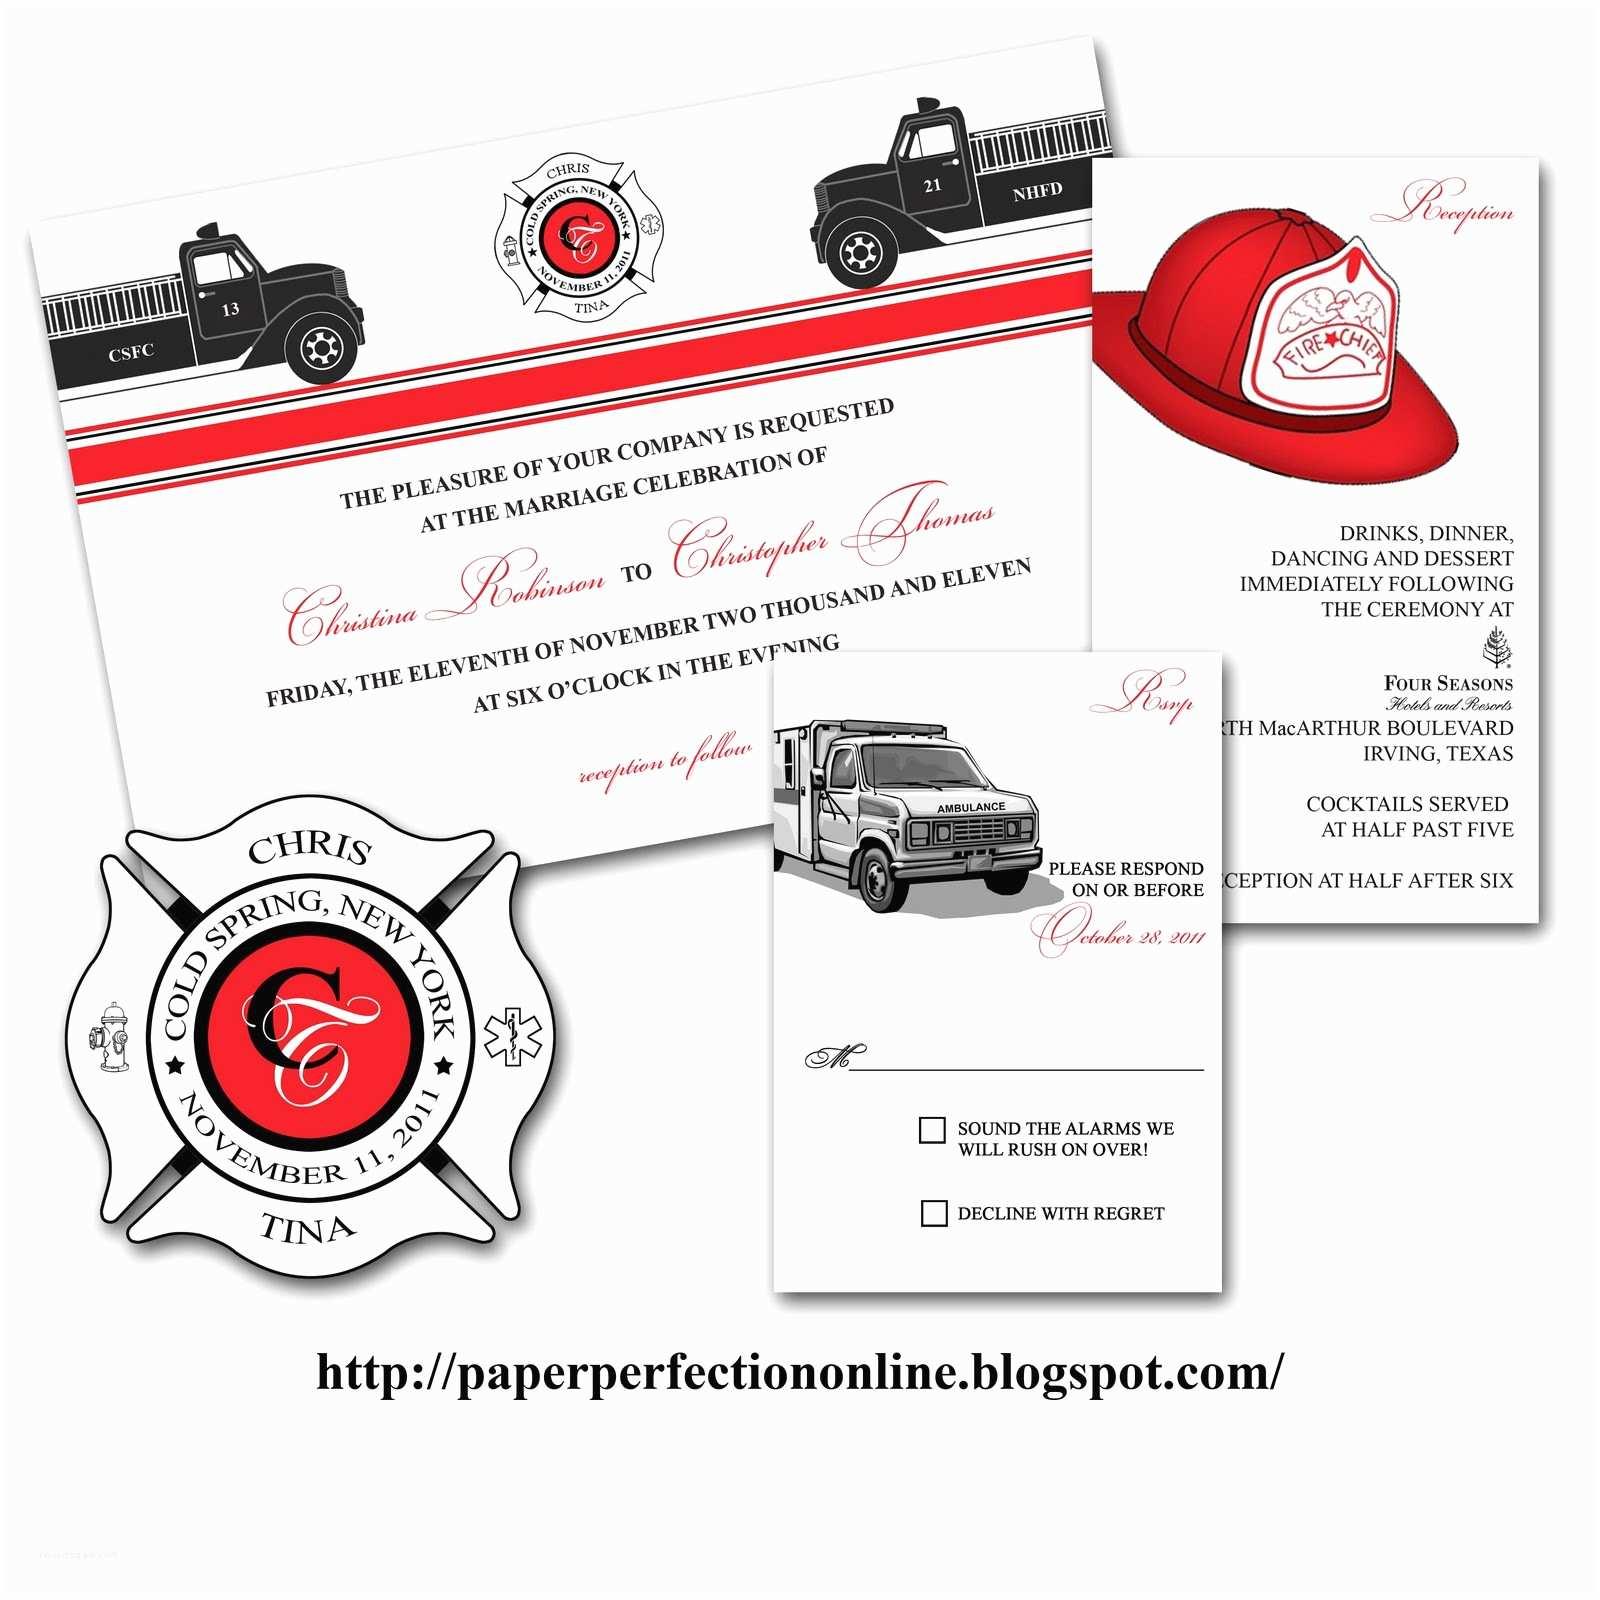 Firefighter themed Wedding Invitations Paper Perfection Tina S Fire Fighter Wedding Invitation